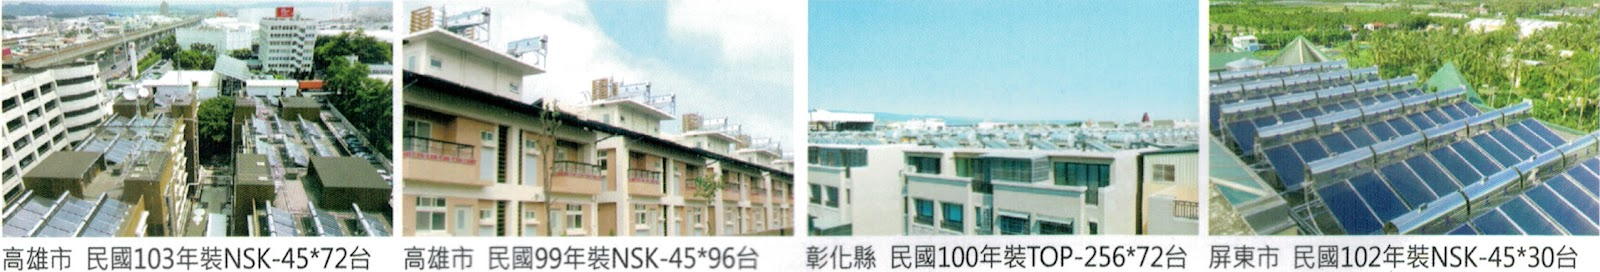 =39DM常態版60-04#正3-3(5).jpg